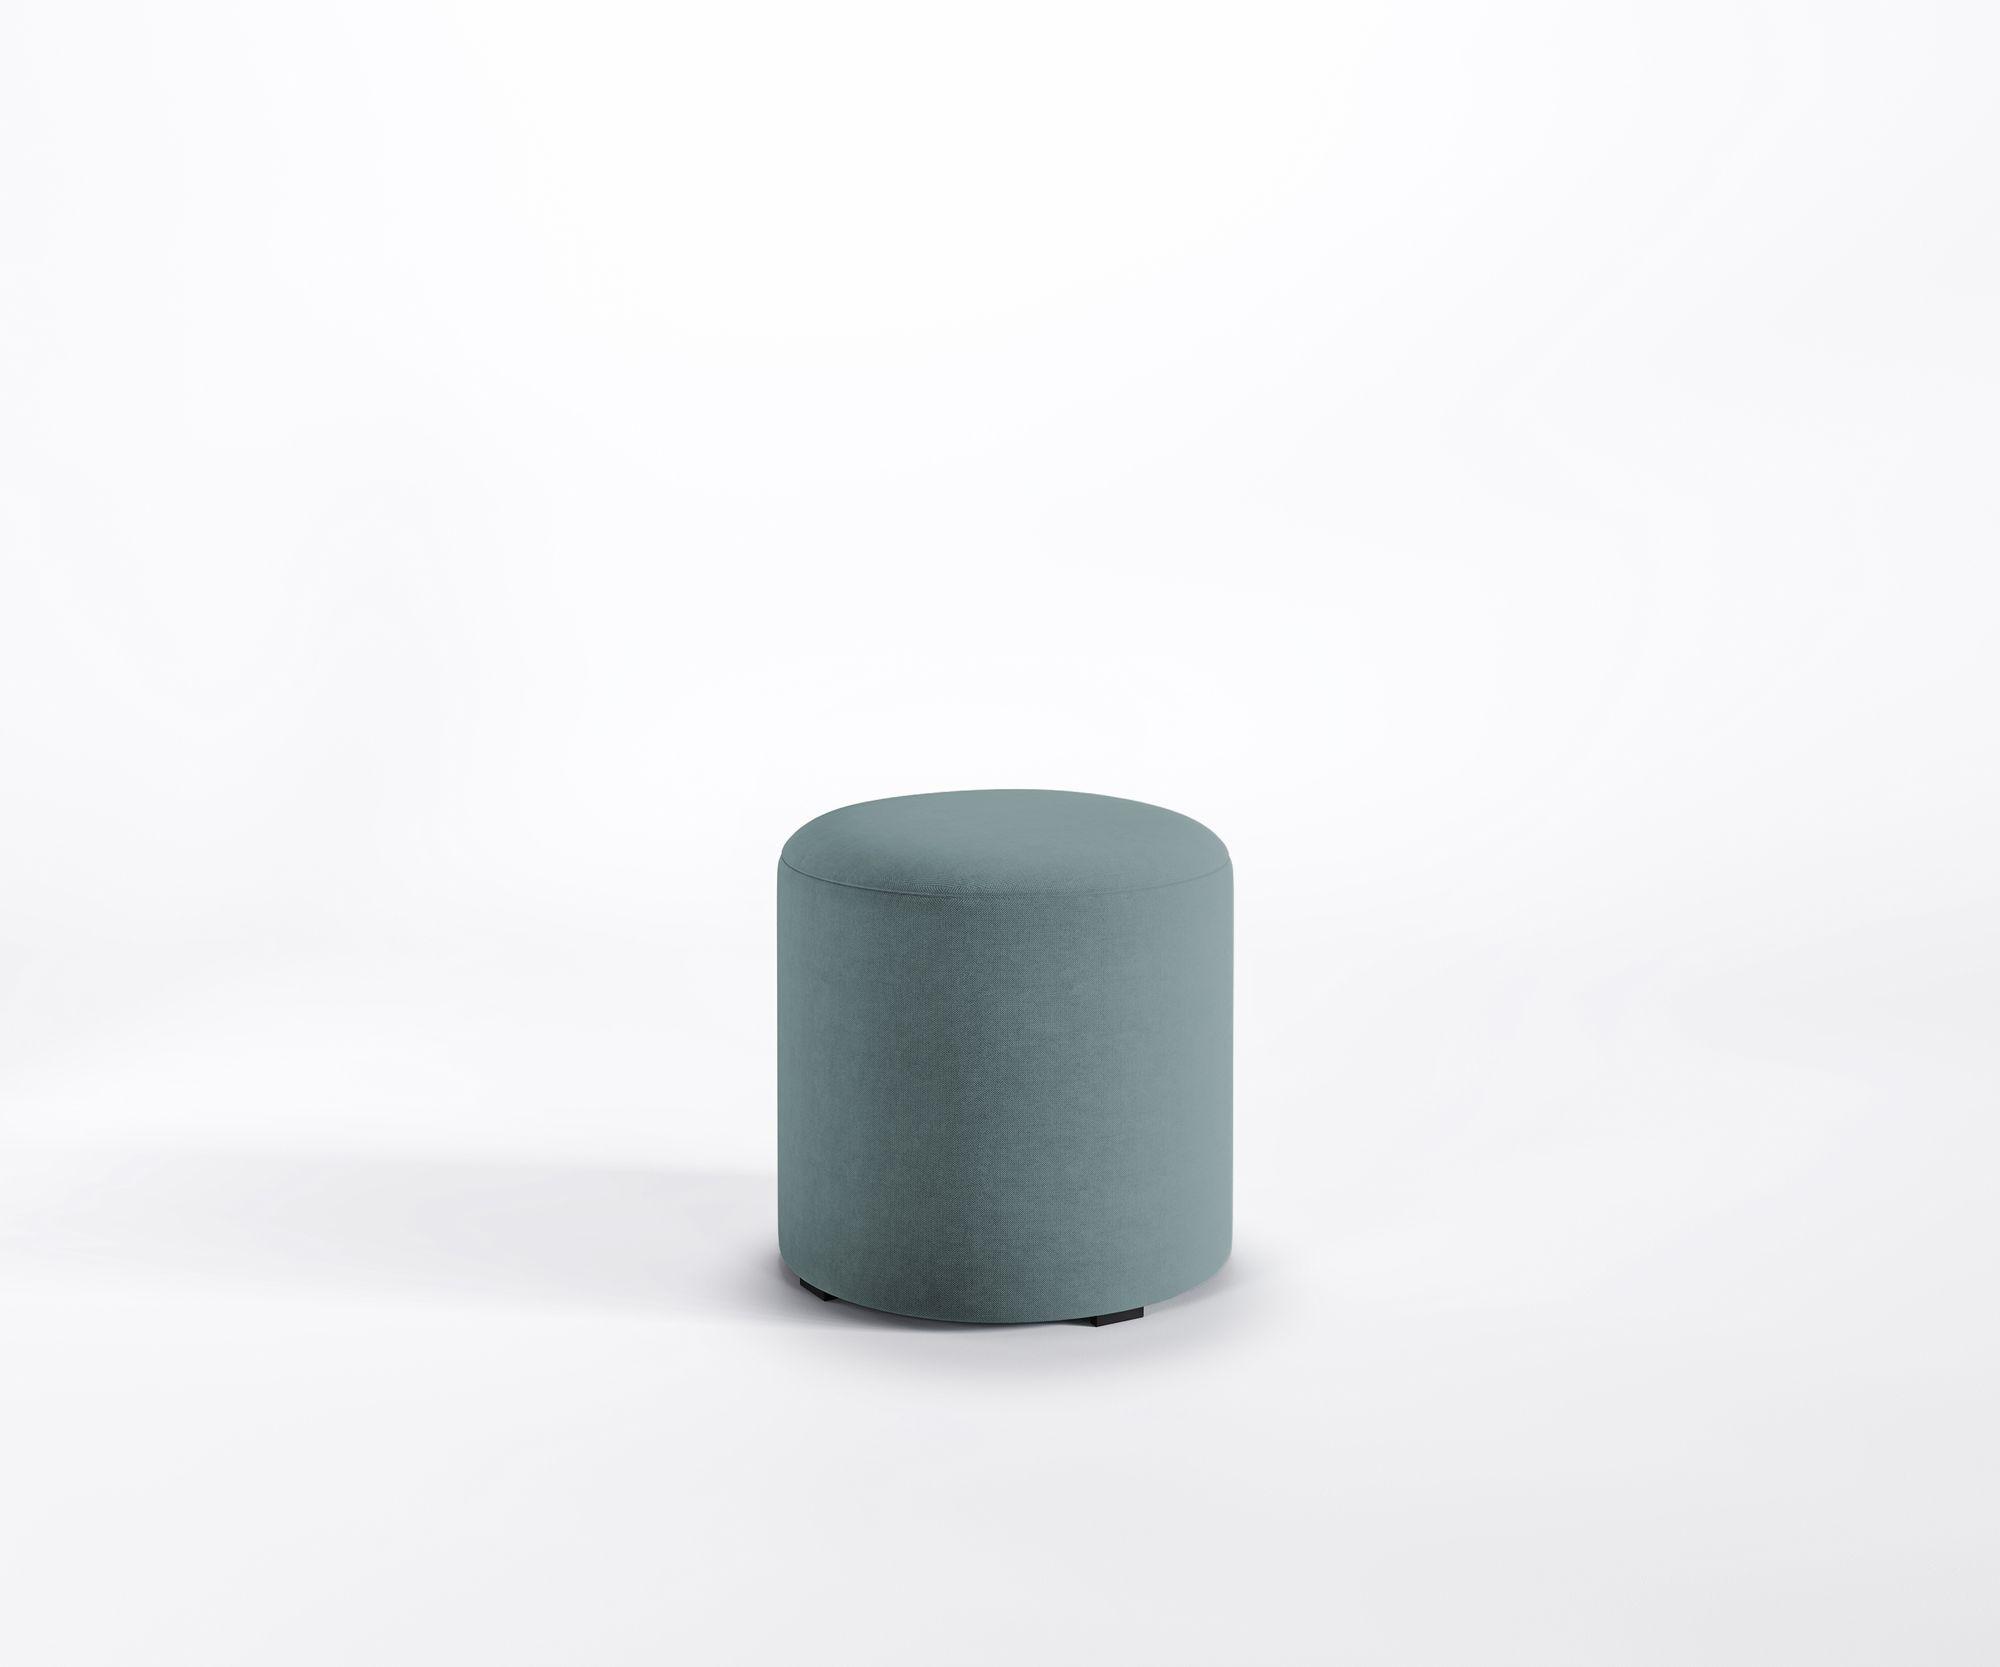 Designer Hocker Mia Roller Lounge Sitzpouf Fußstütze Polster